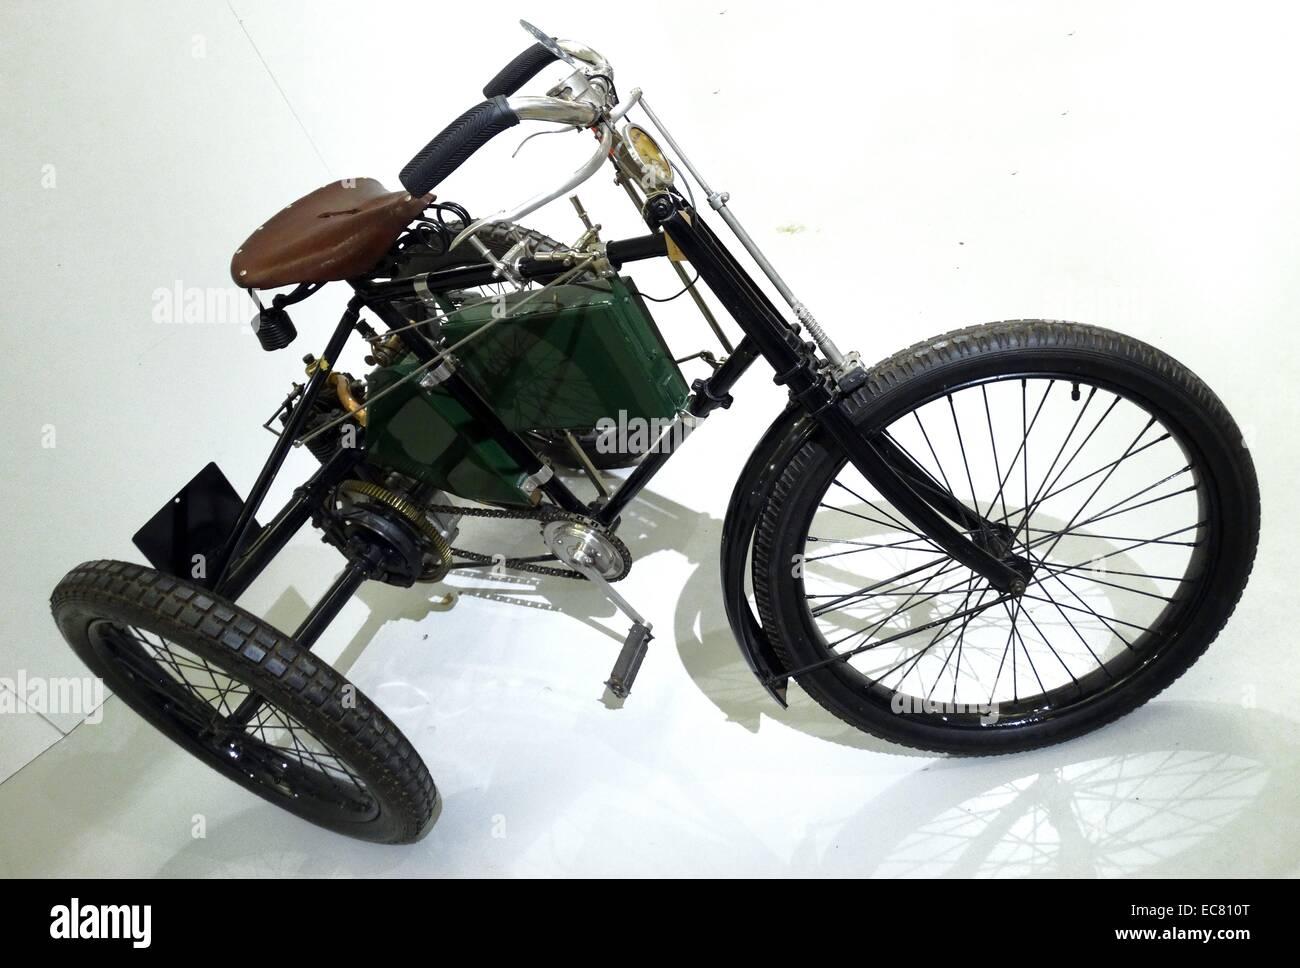 3.5hp Royal Riley motorised tricycle - Stock Image